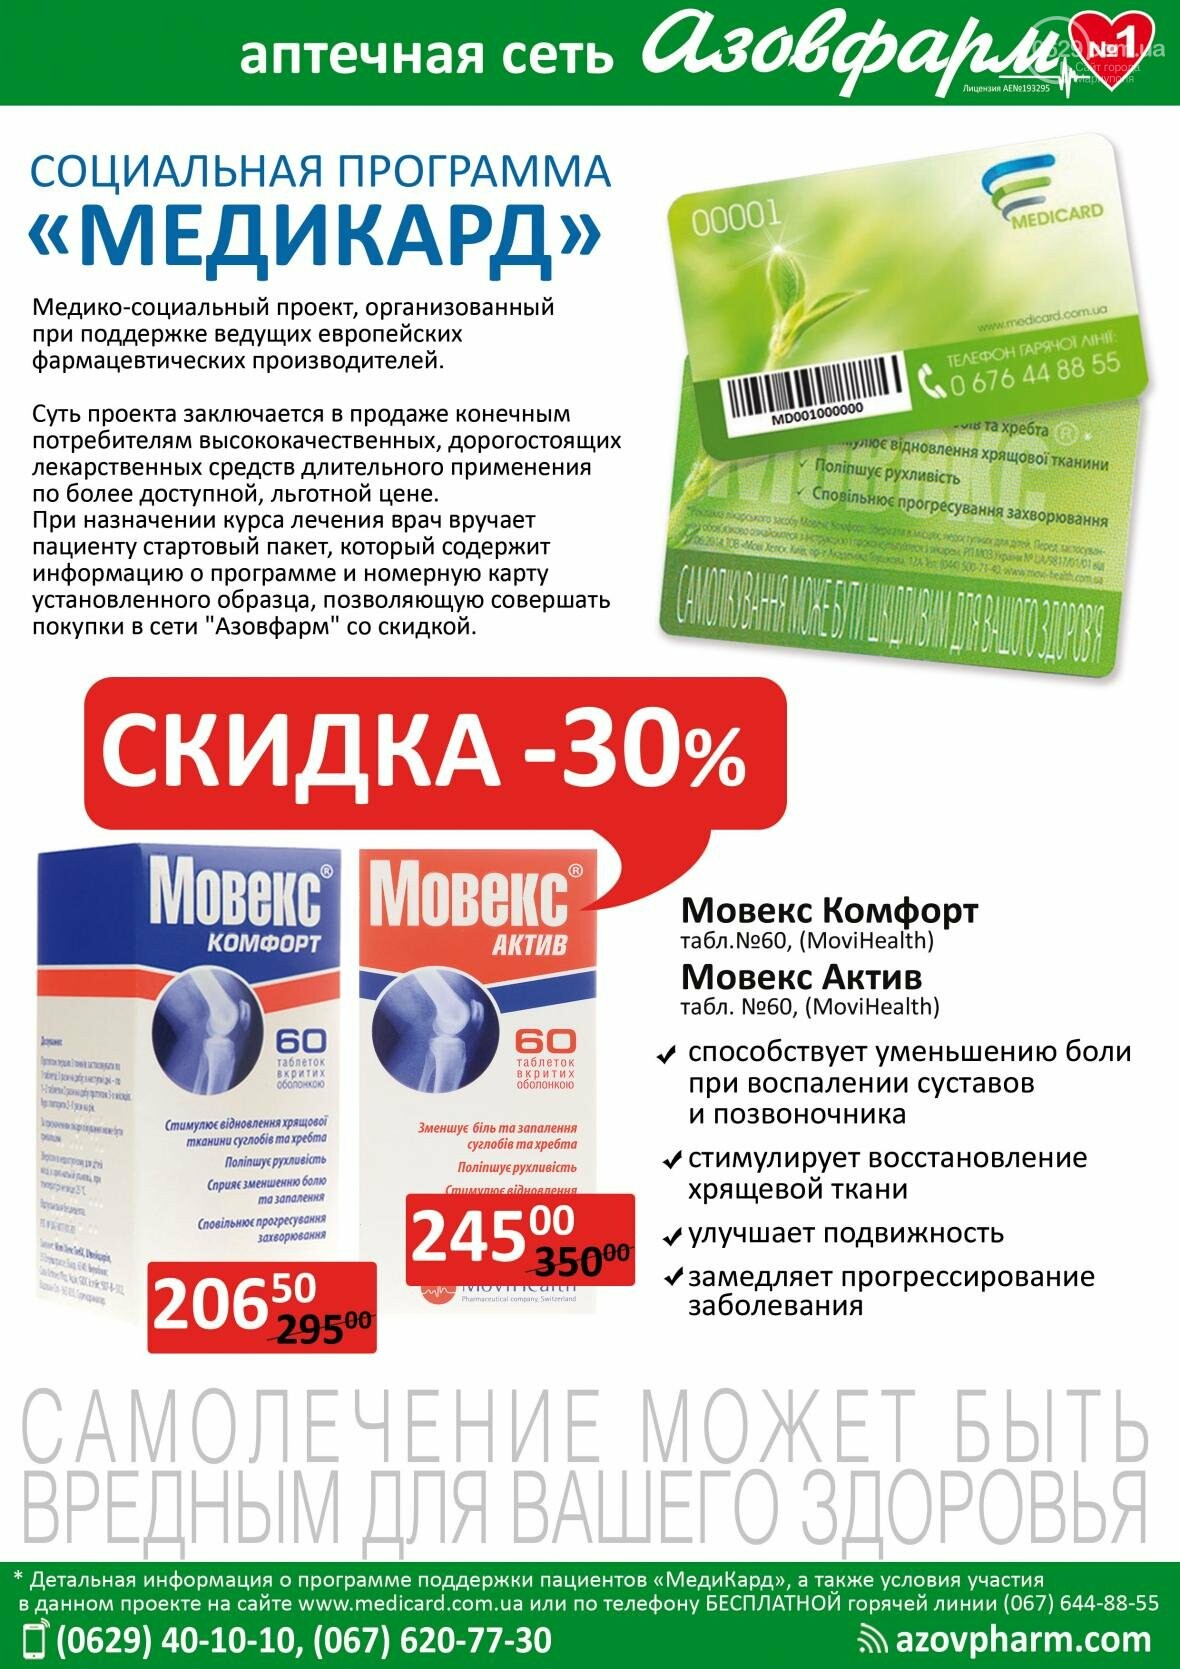 Жаркие скидки в аптеках «Азовфарм»!, фото-2